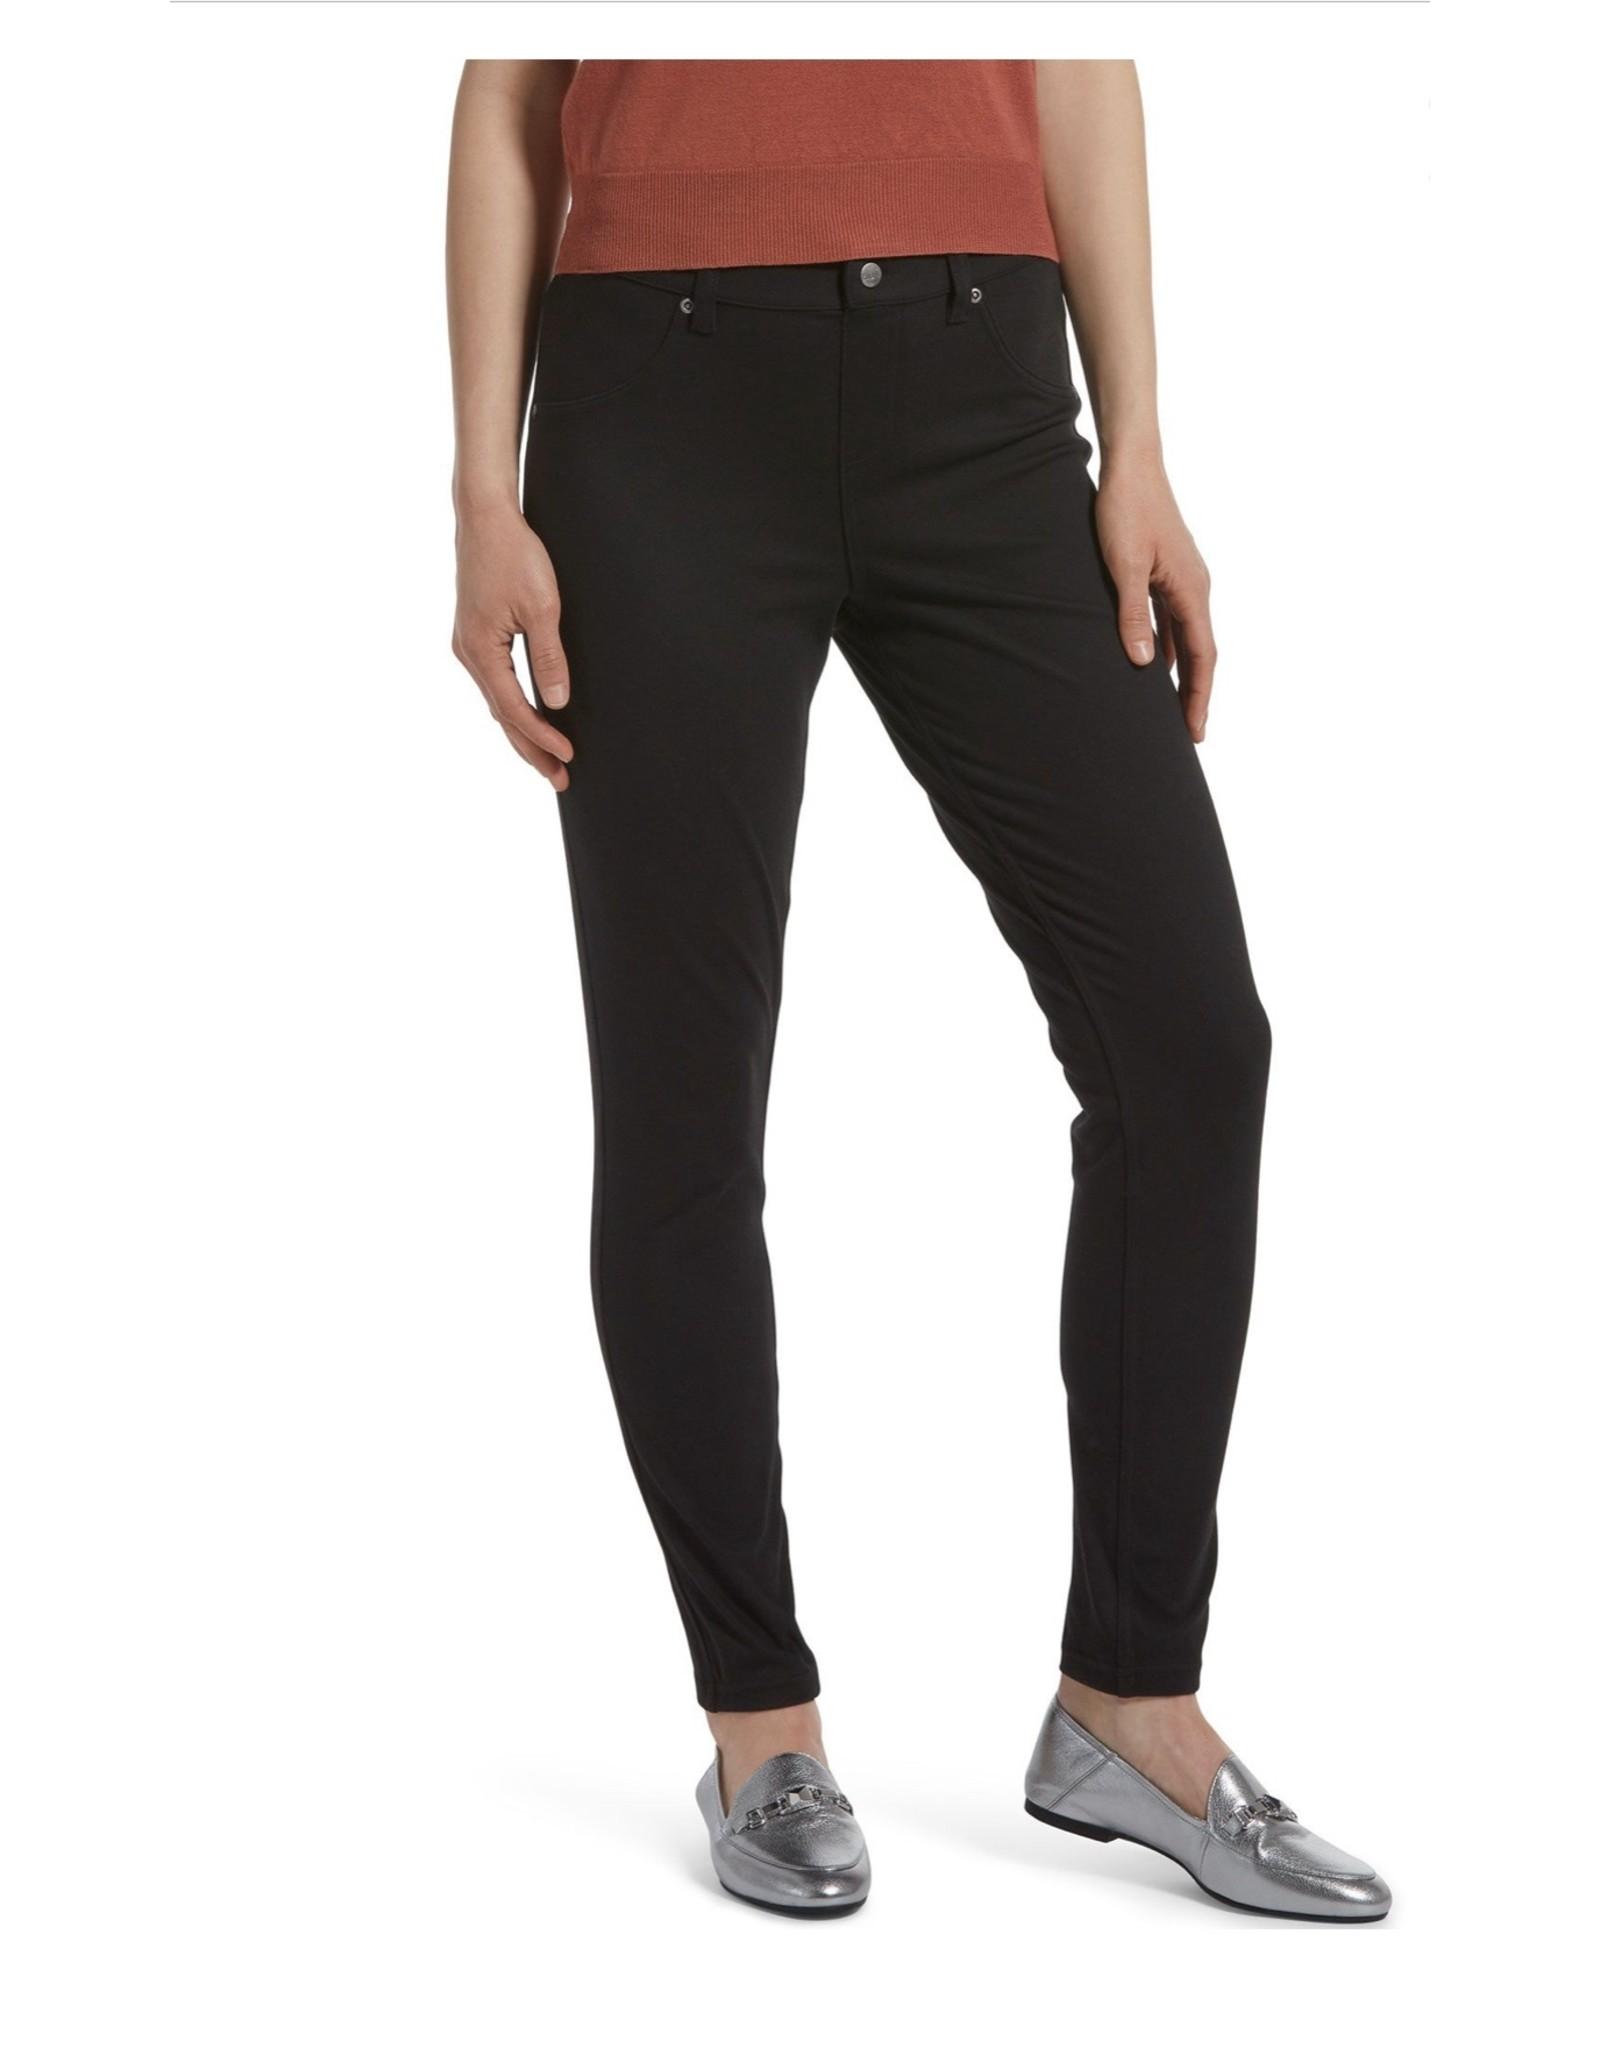 Hue Hue Women's Ultra Soft High Waist Denim Leggings